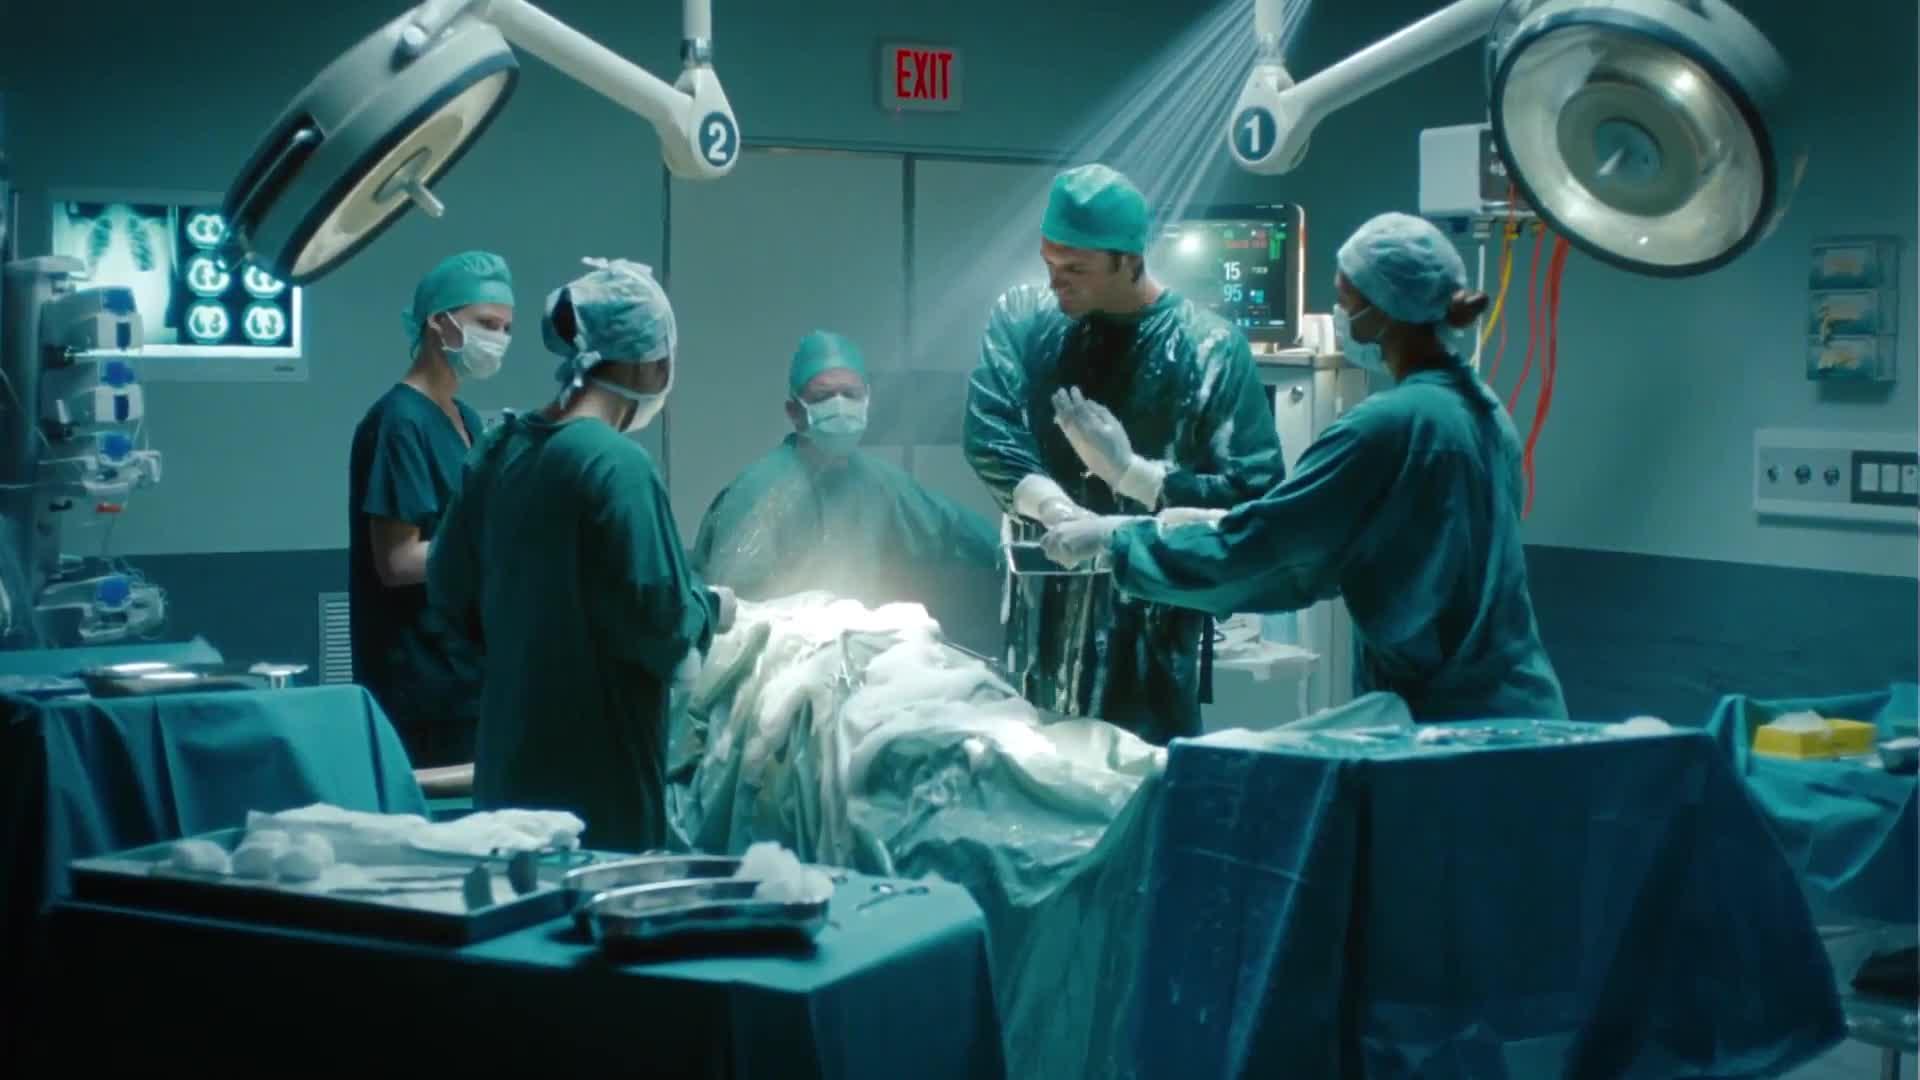 Surgeon Desktop Wallpapers Top Free Surgeon Desktop Backgrounds Wallpaperaccess